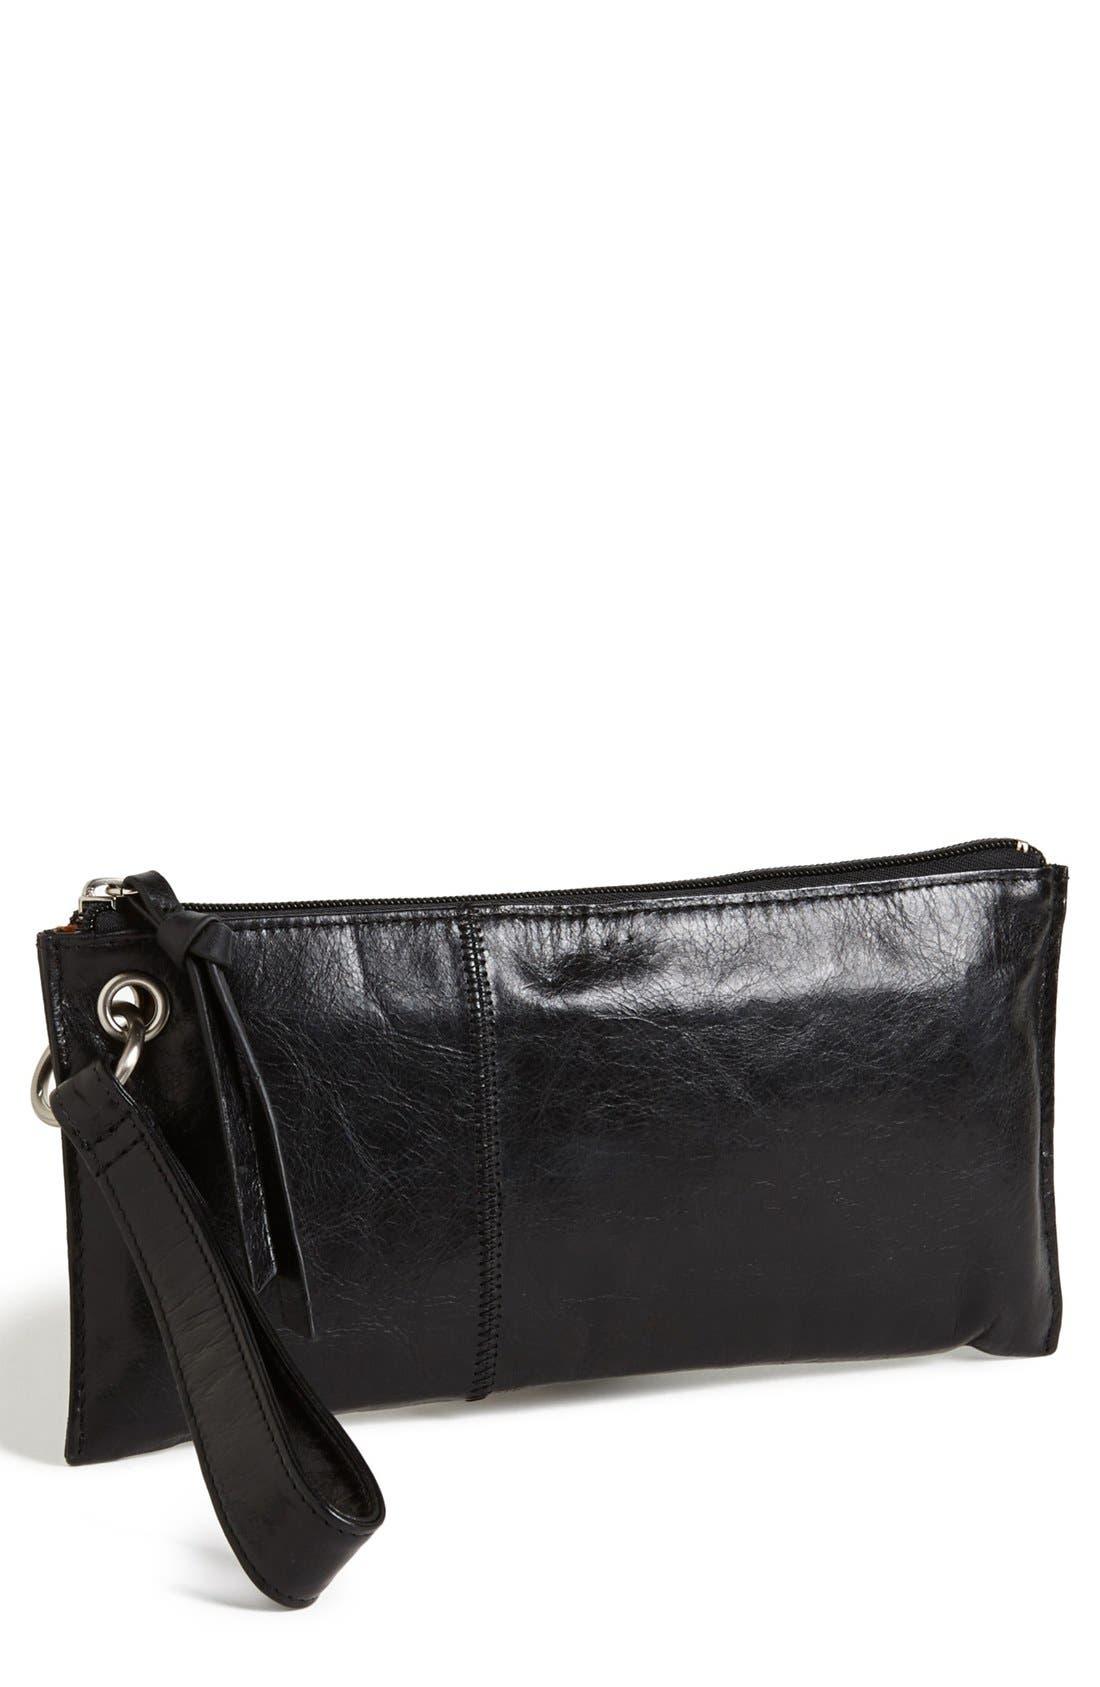 Alternate Image 1 Selected - Hobo 'Vida' Leather Clutch